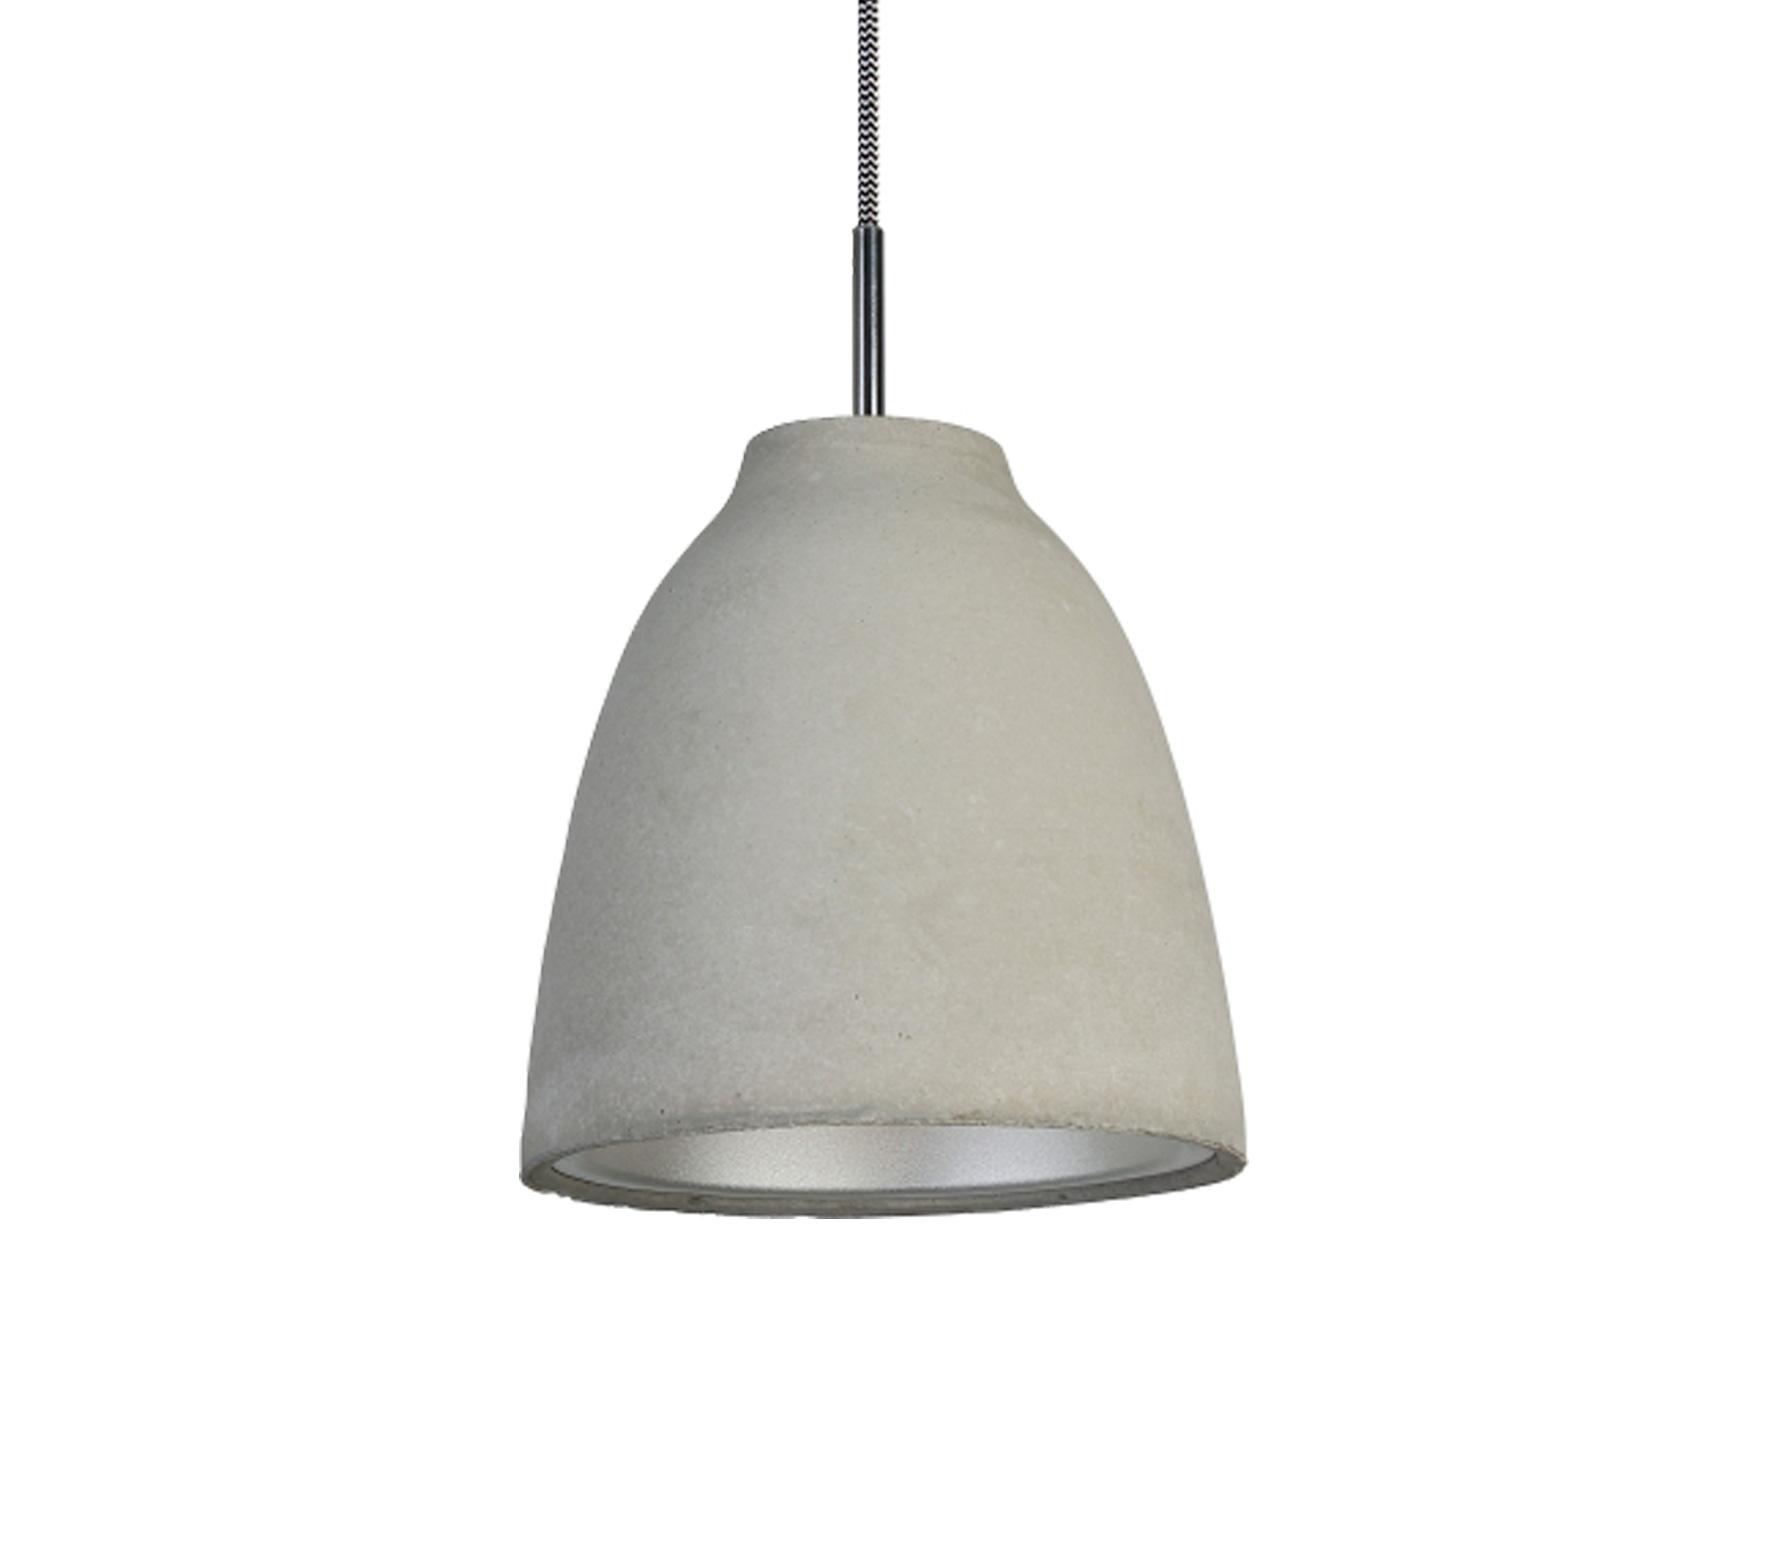 Rostock hanglamp Ø 20,5 cm beton Beton